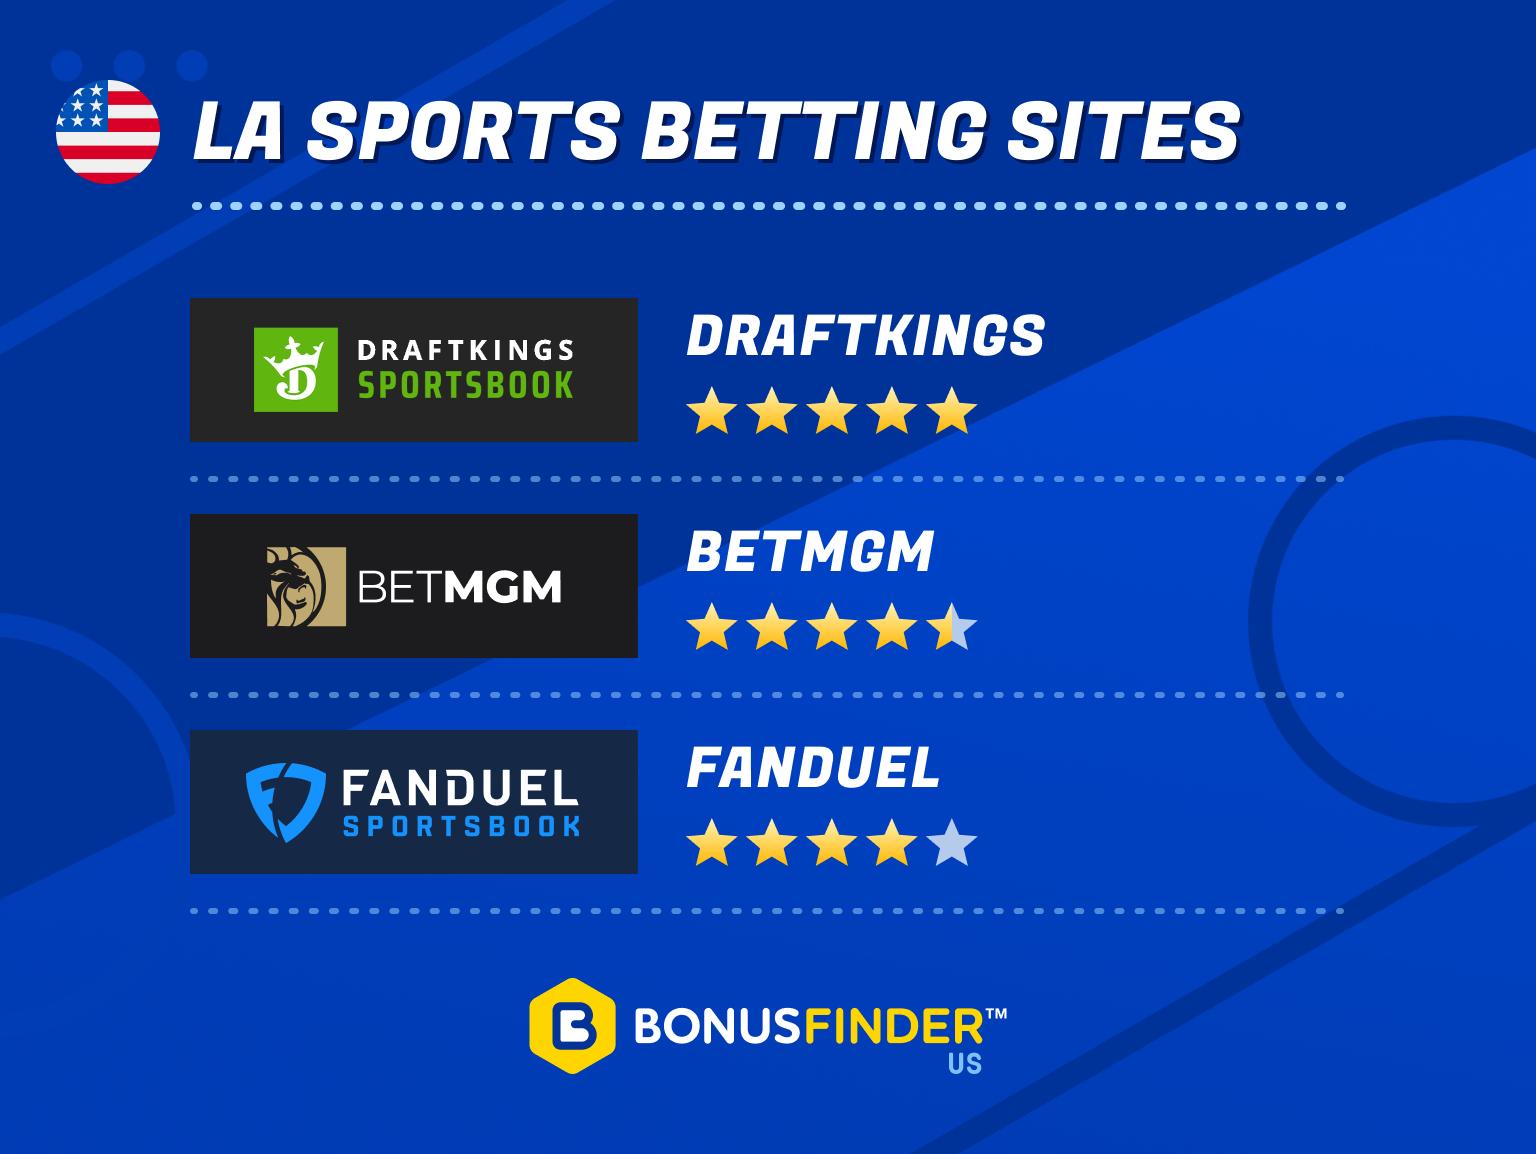 louisiana sports betting sites